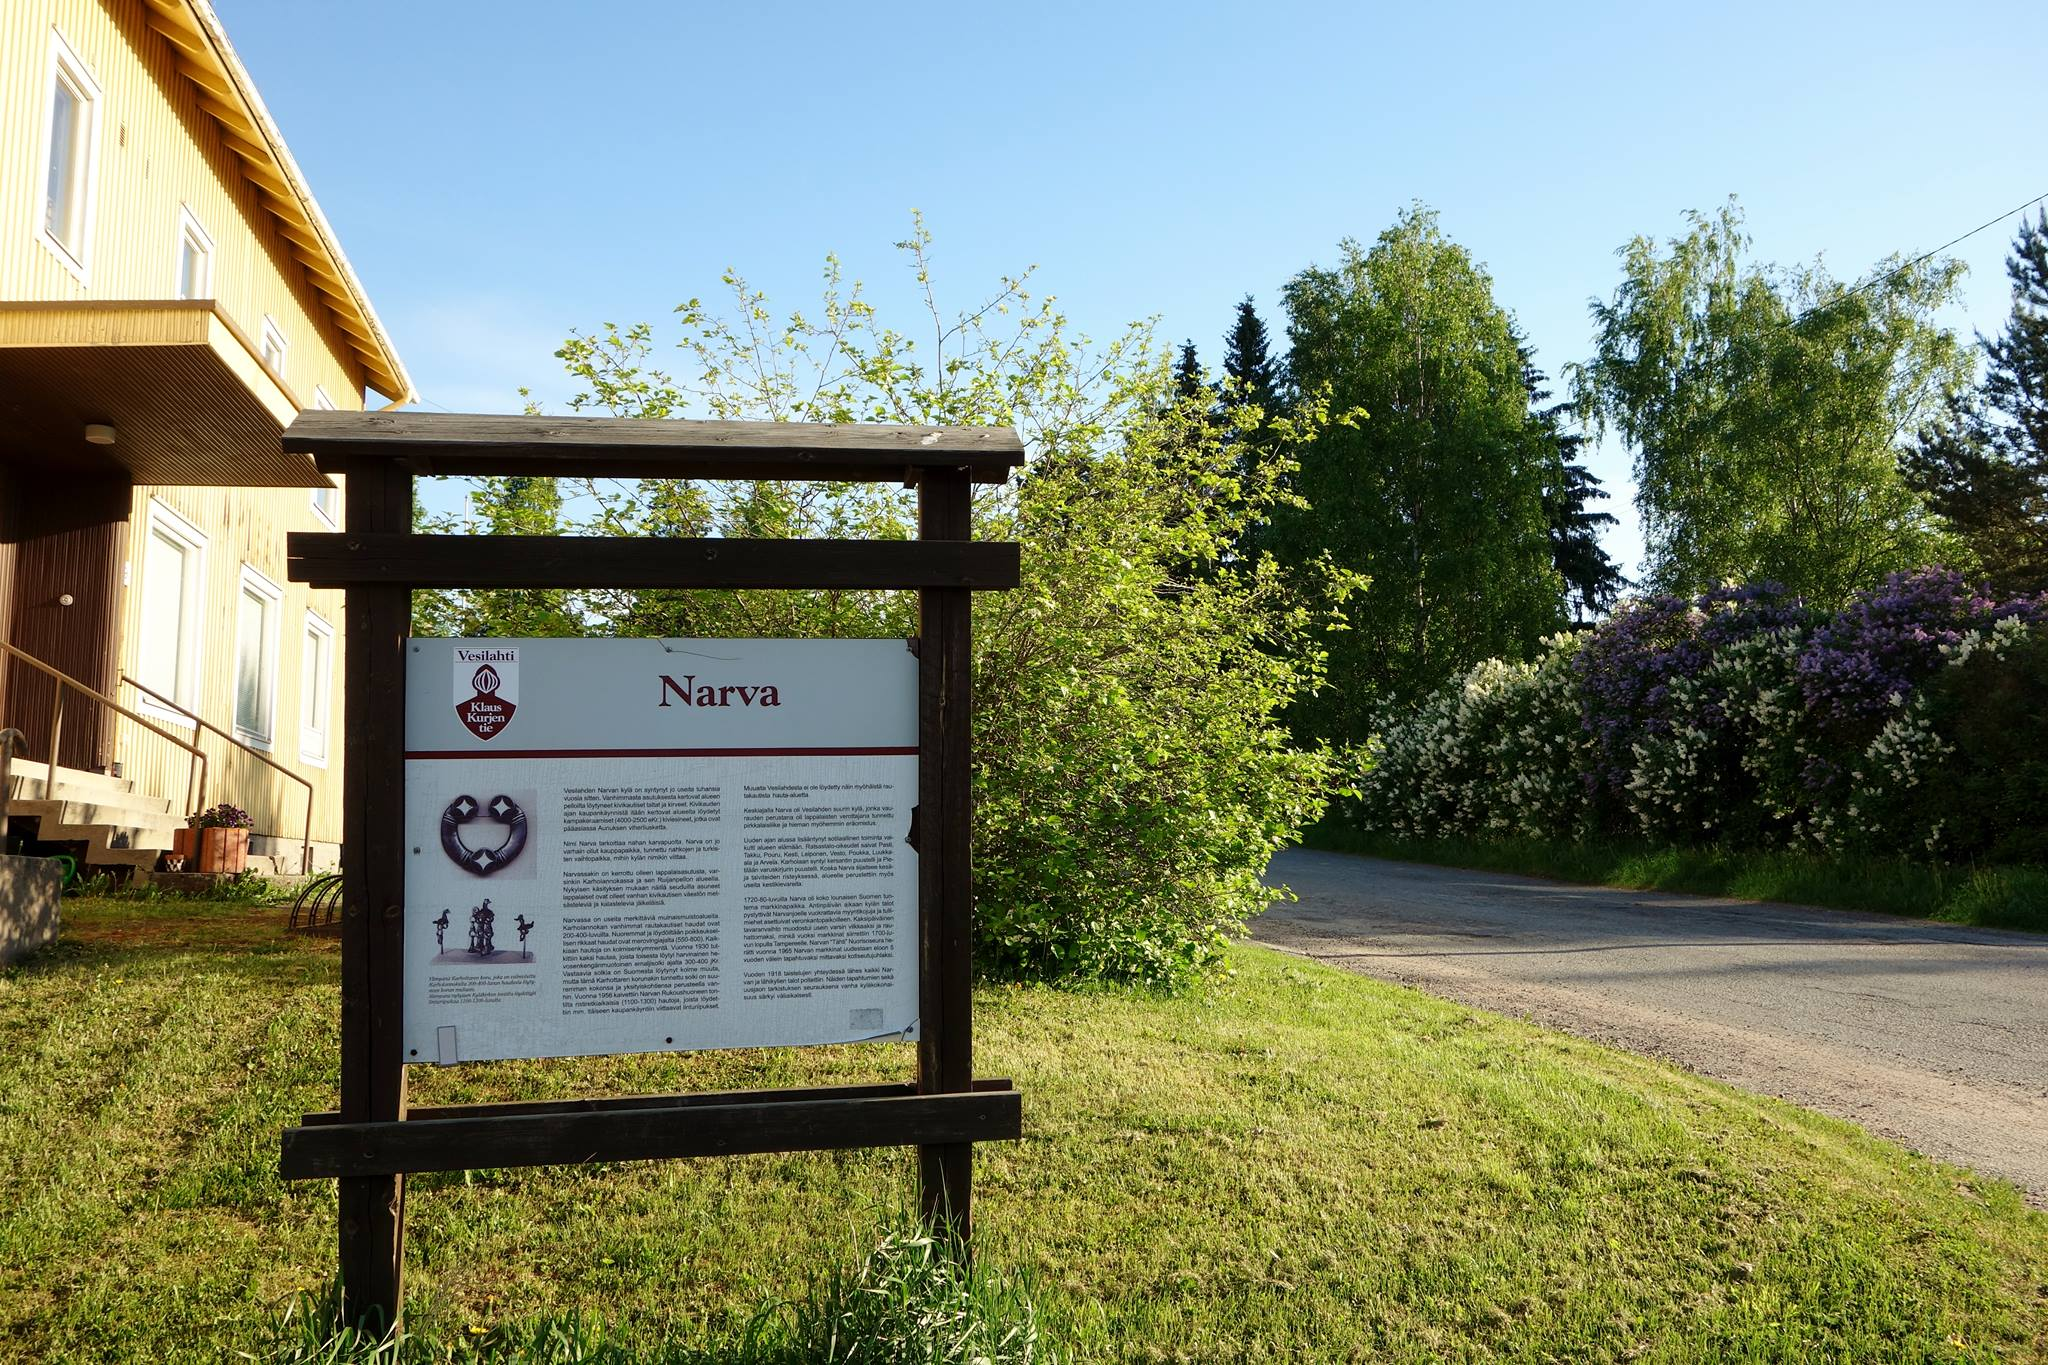 Galerii: Soome Narva asub Tampere külje all